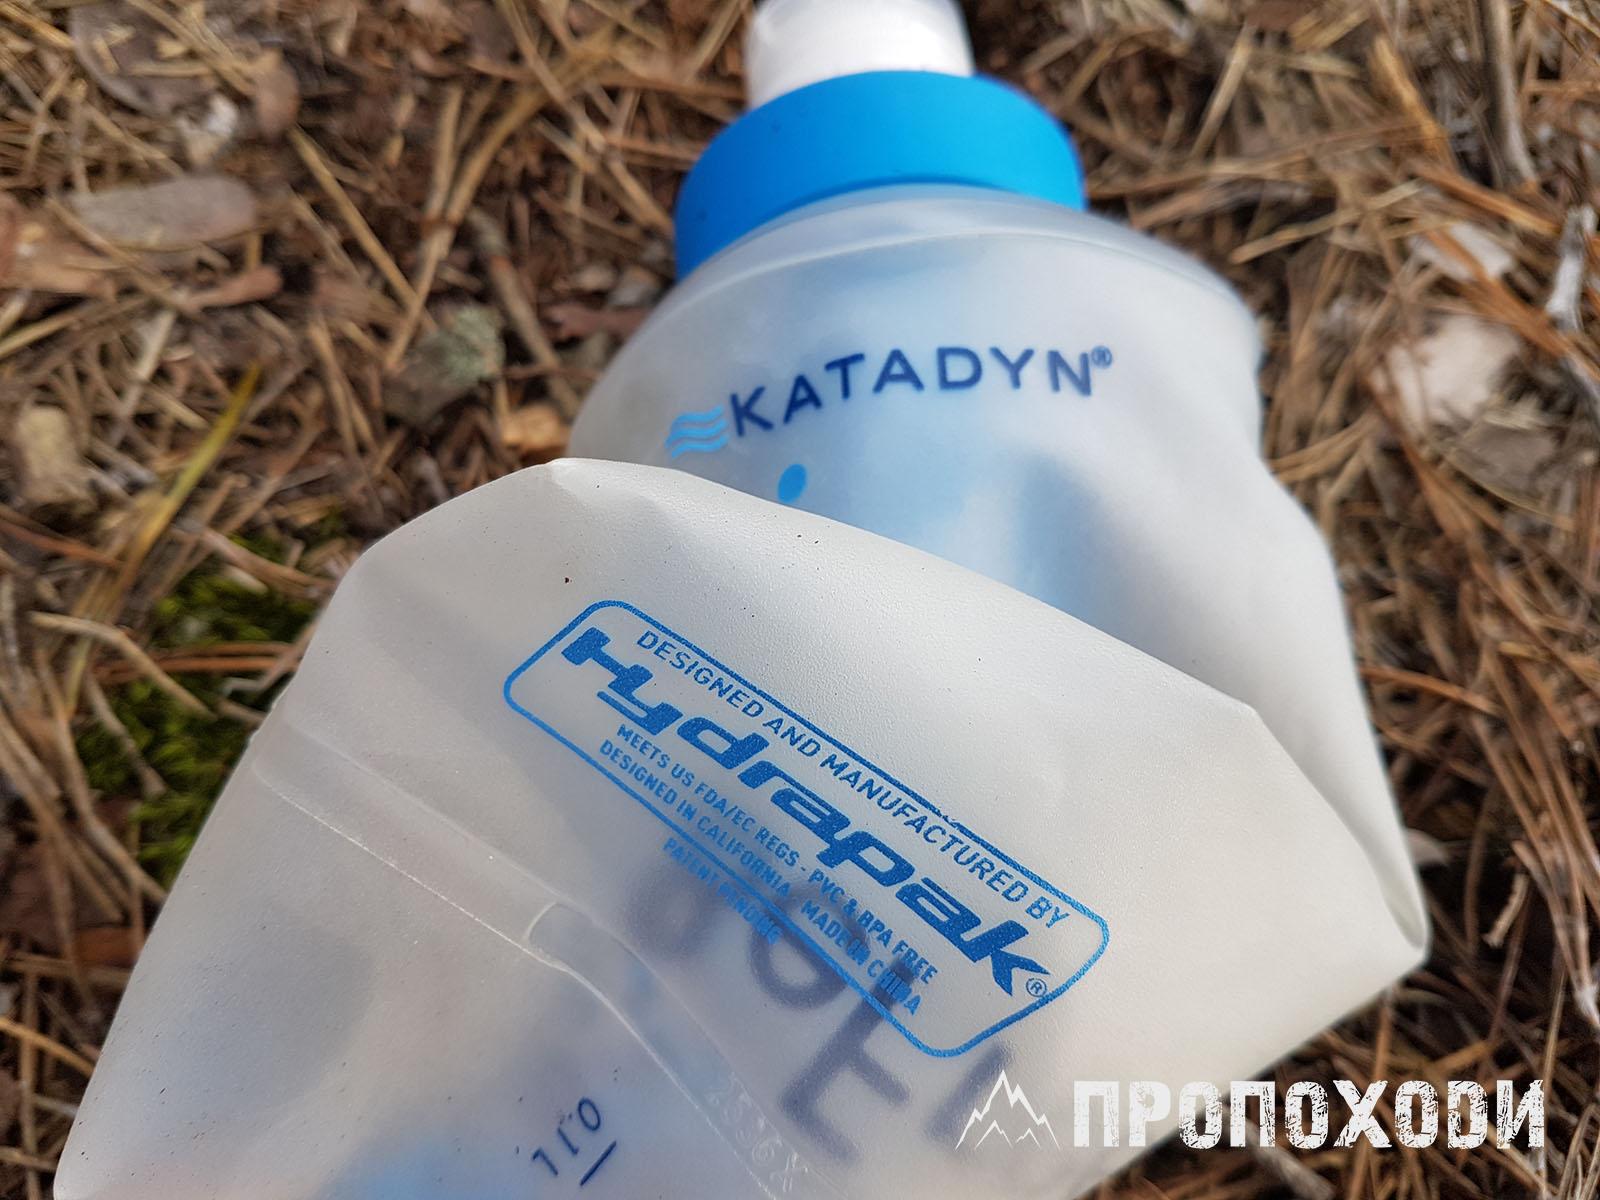 Katadyn BeFree